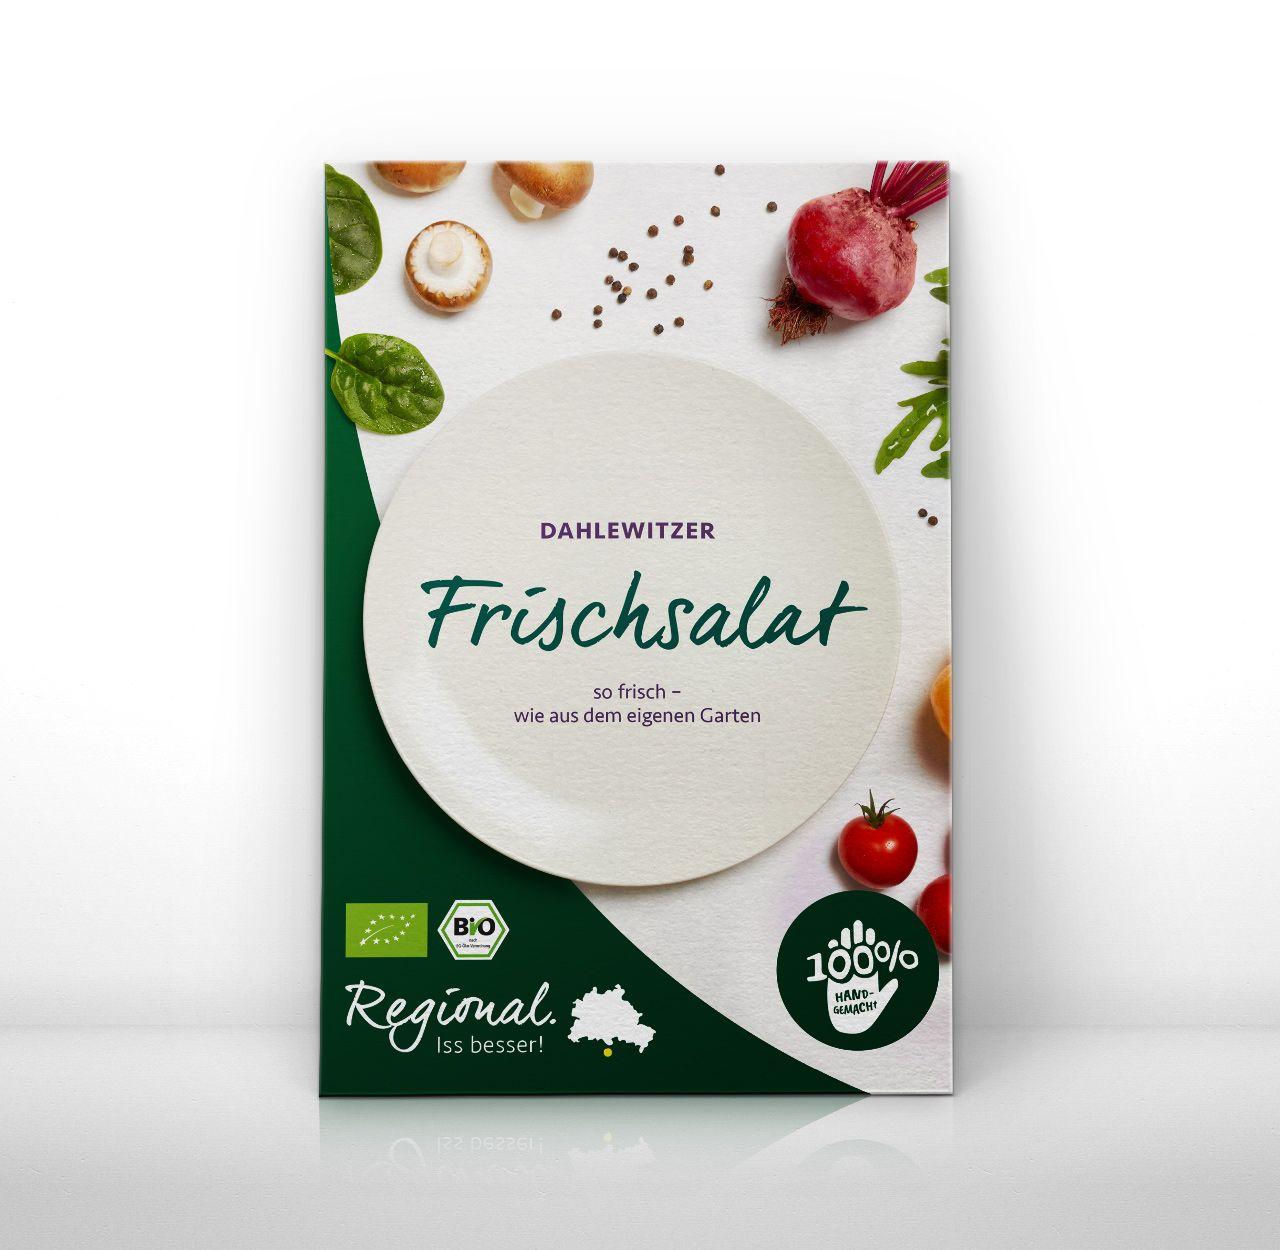 Jouis Nour Dahlewitzer fresh salat